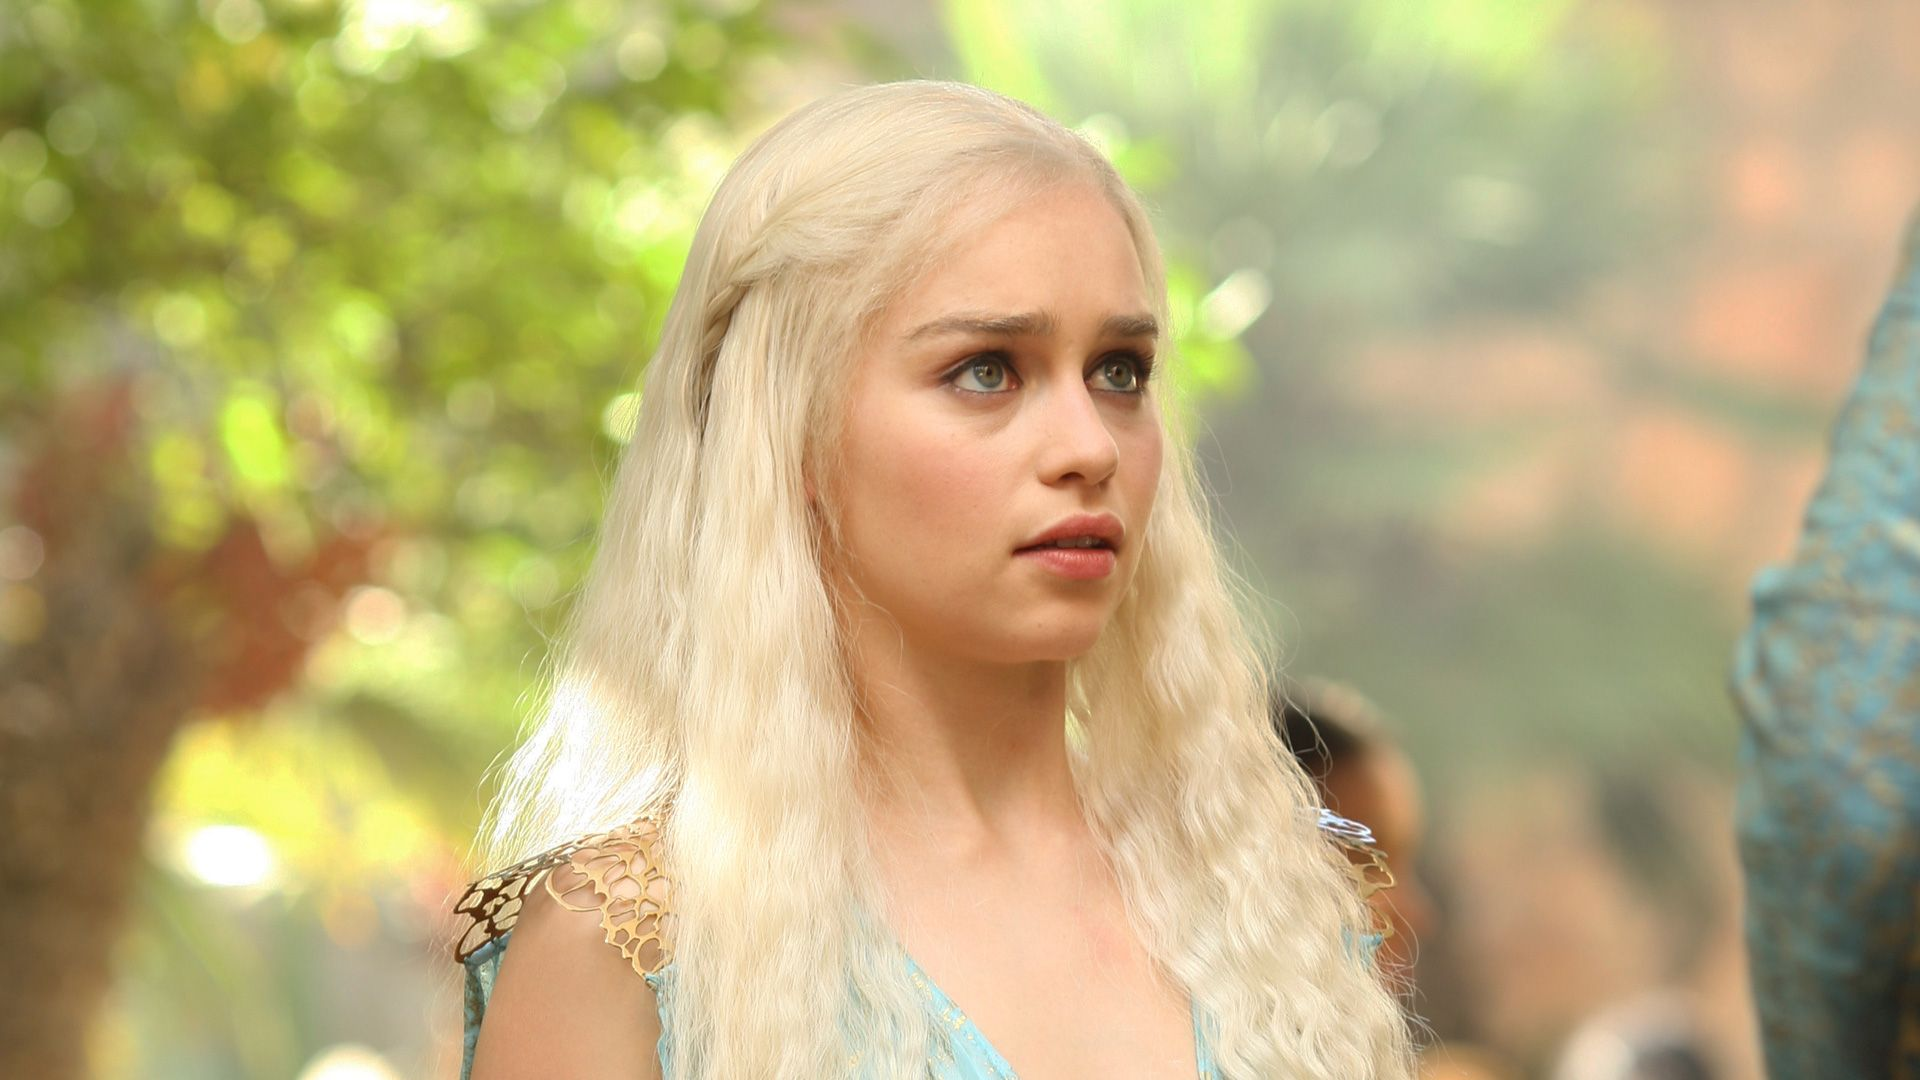 Khaleesi Game Of Thrones HD Wallpaper « Destkop